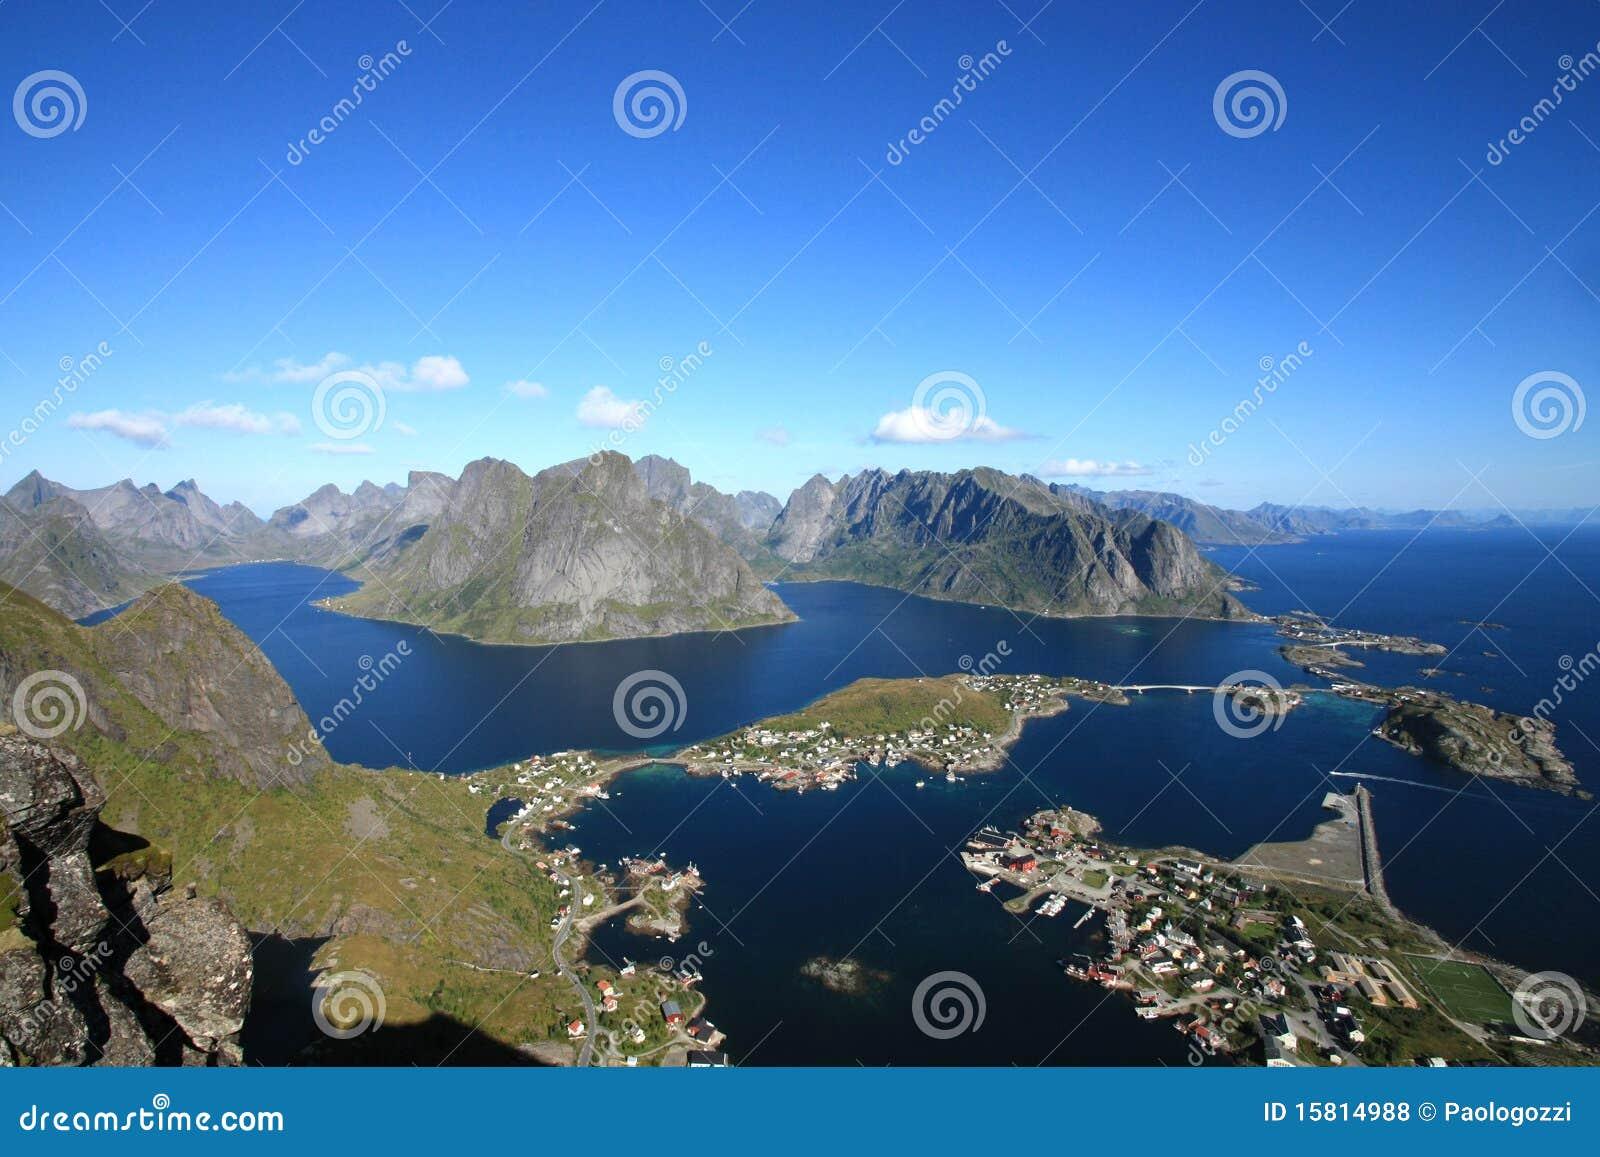 Lofoten s fjords